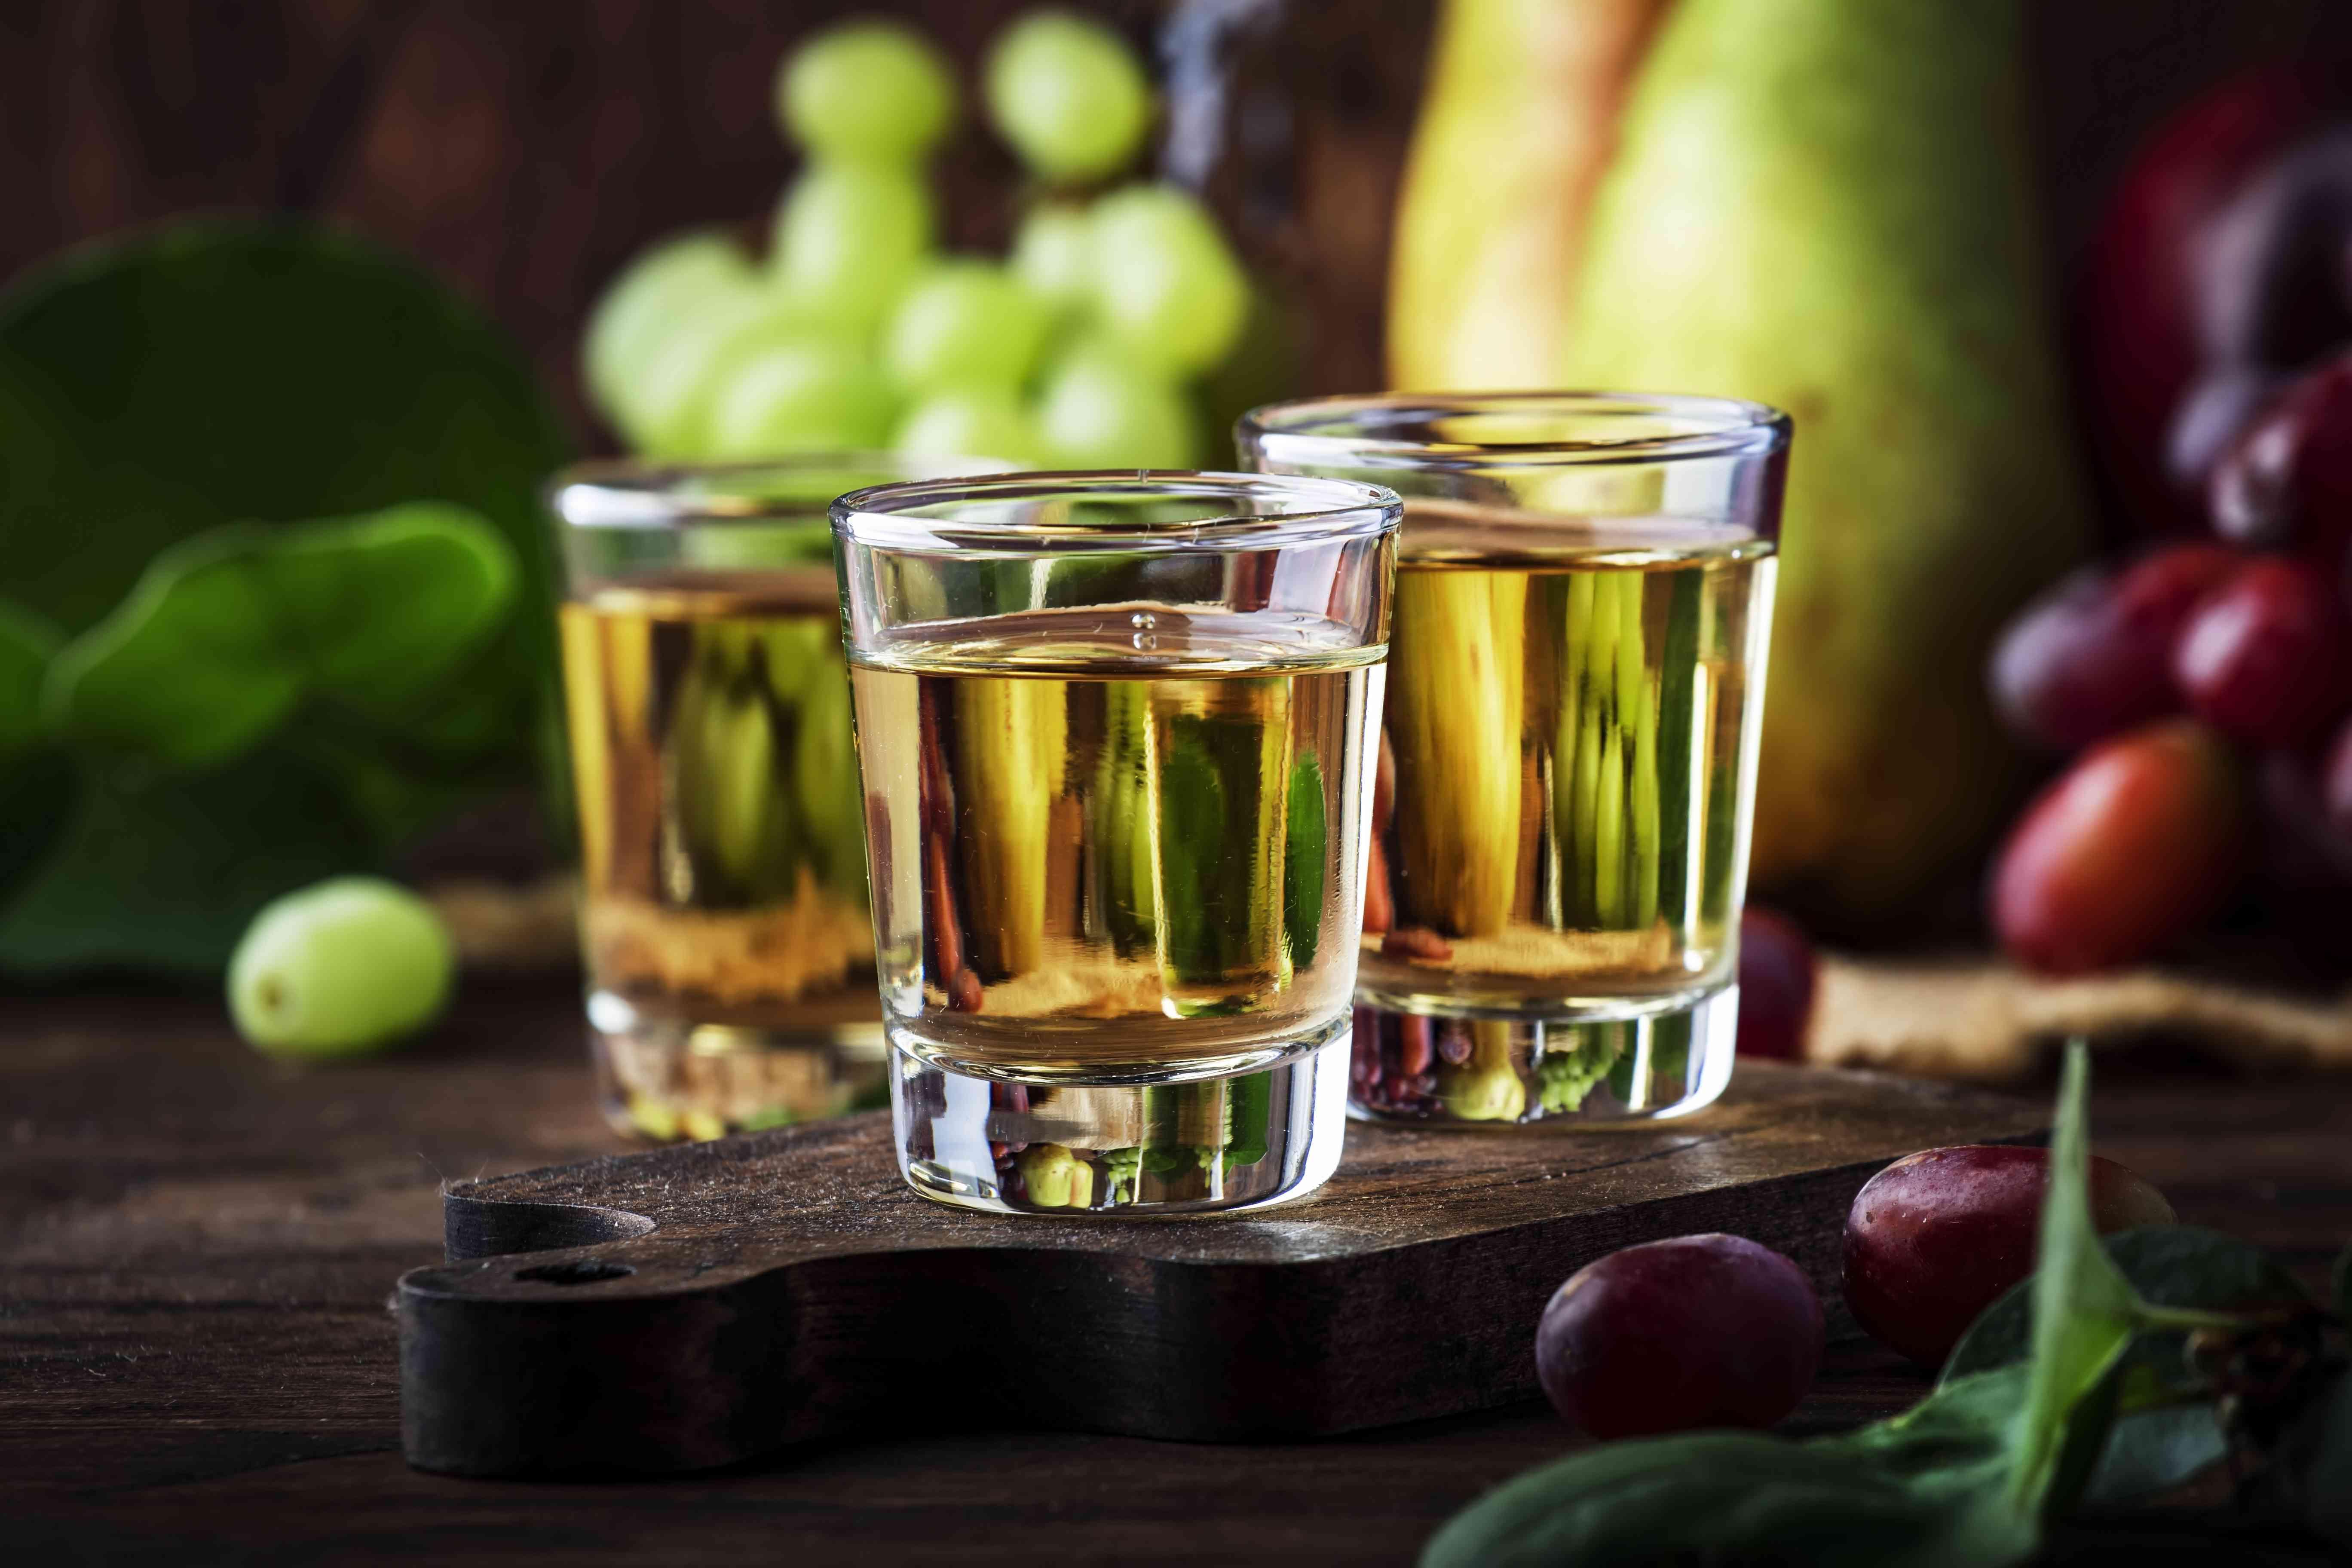 Rakija, raki or rakia - Balkan hard alcoholic drink or brandy from fermented fruits, old wooden table, still life, copy space